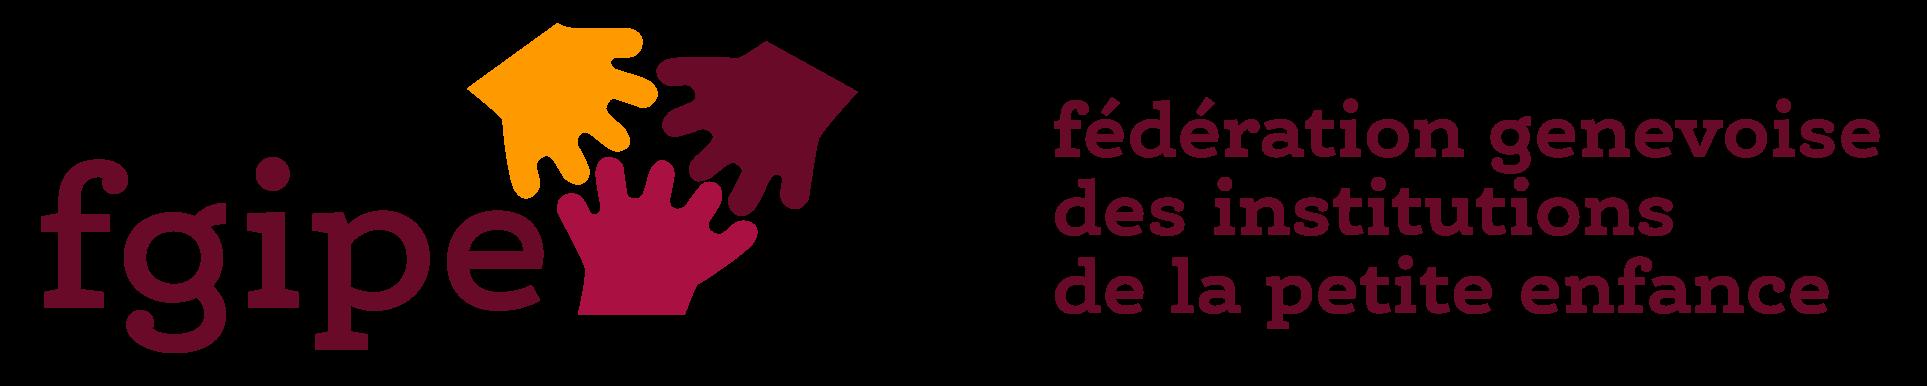 logo fgipe